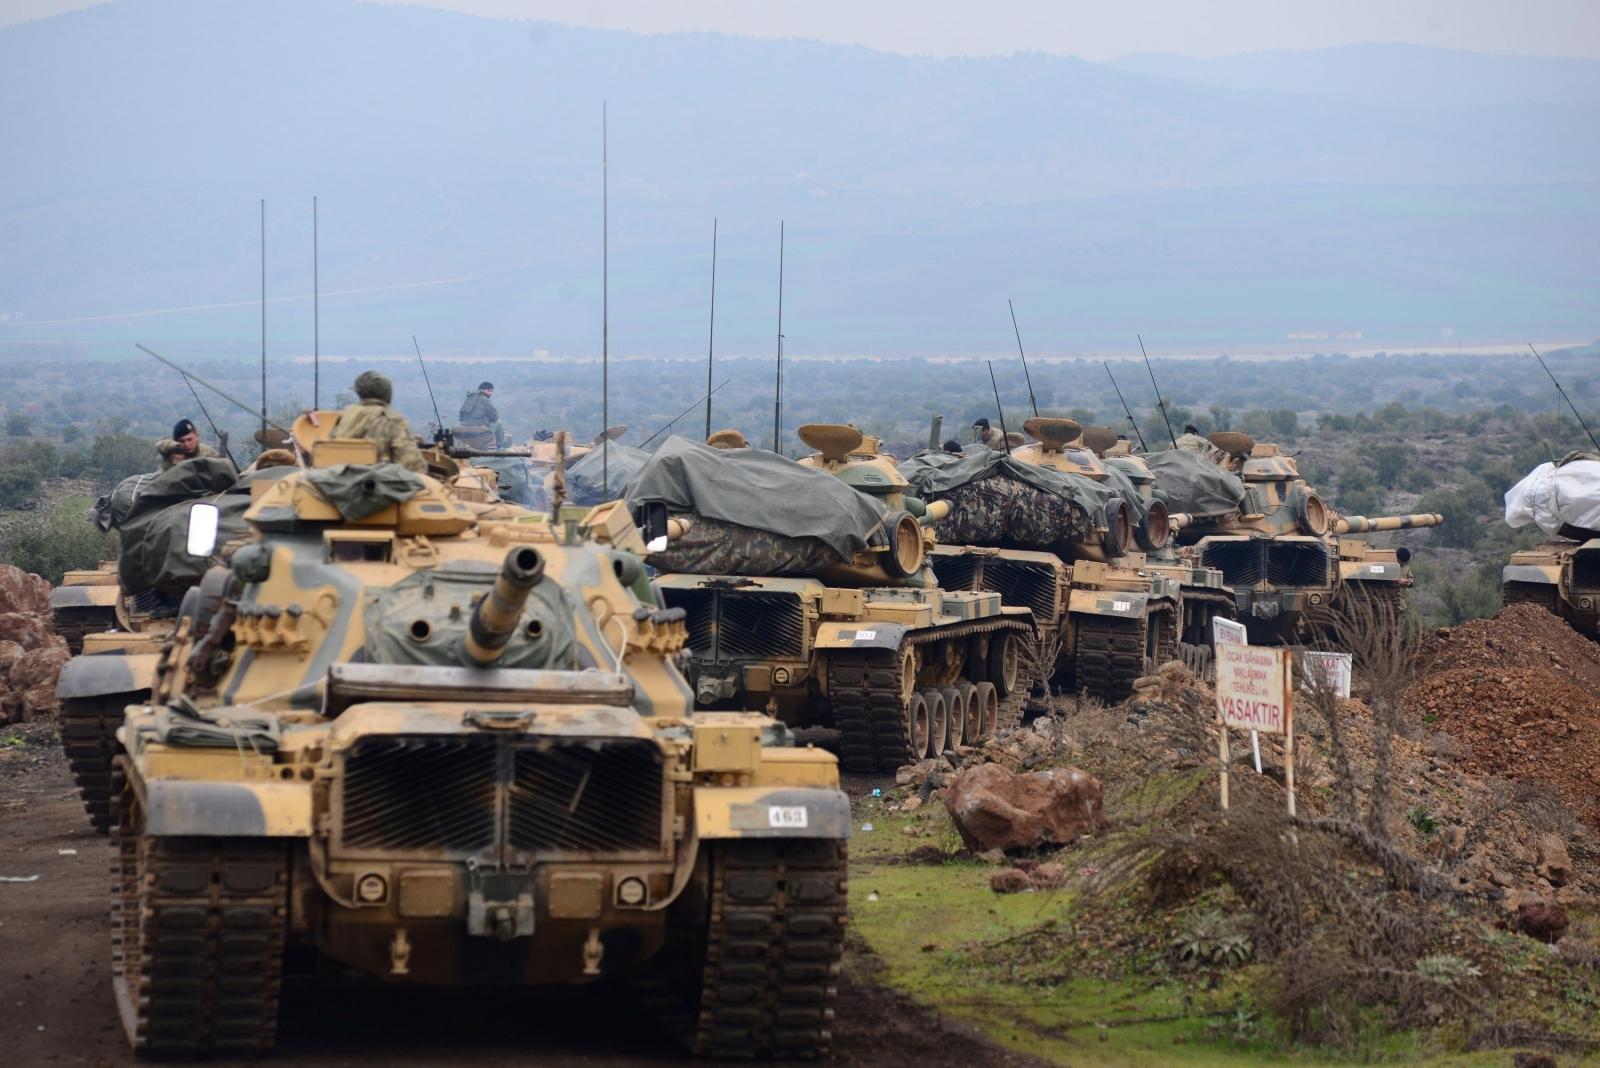 Turkey Syria tensions